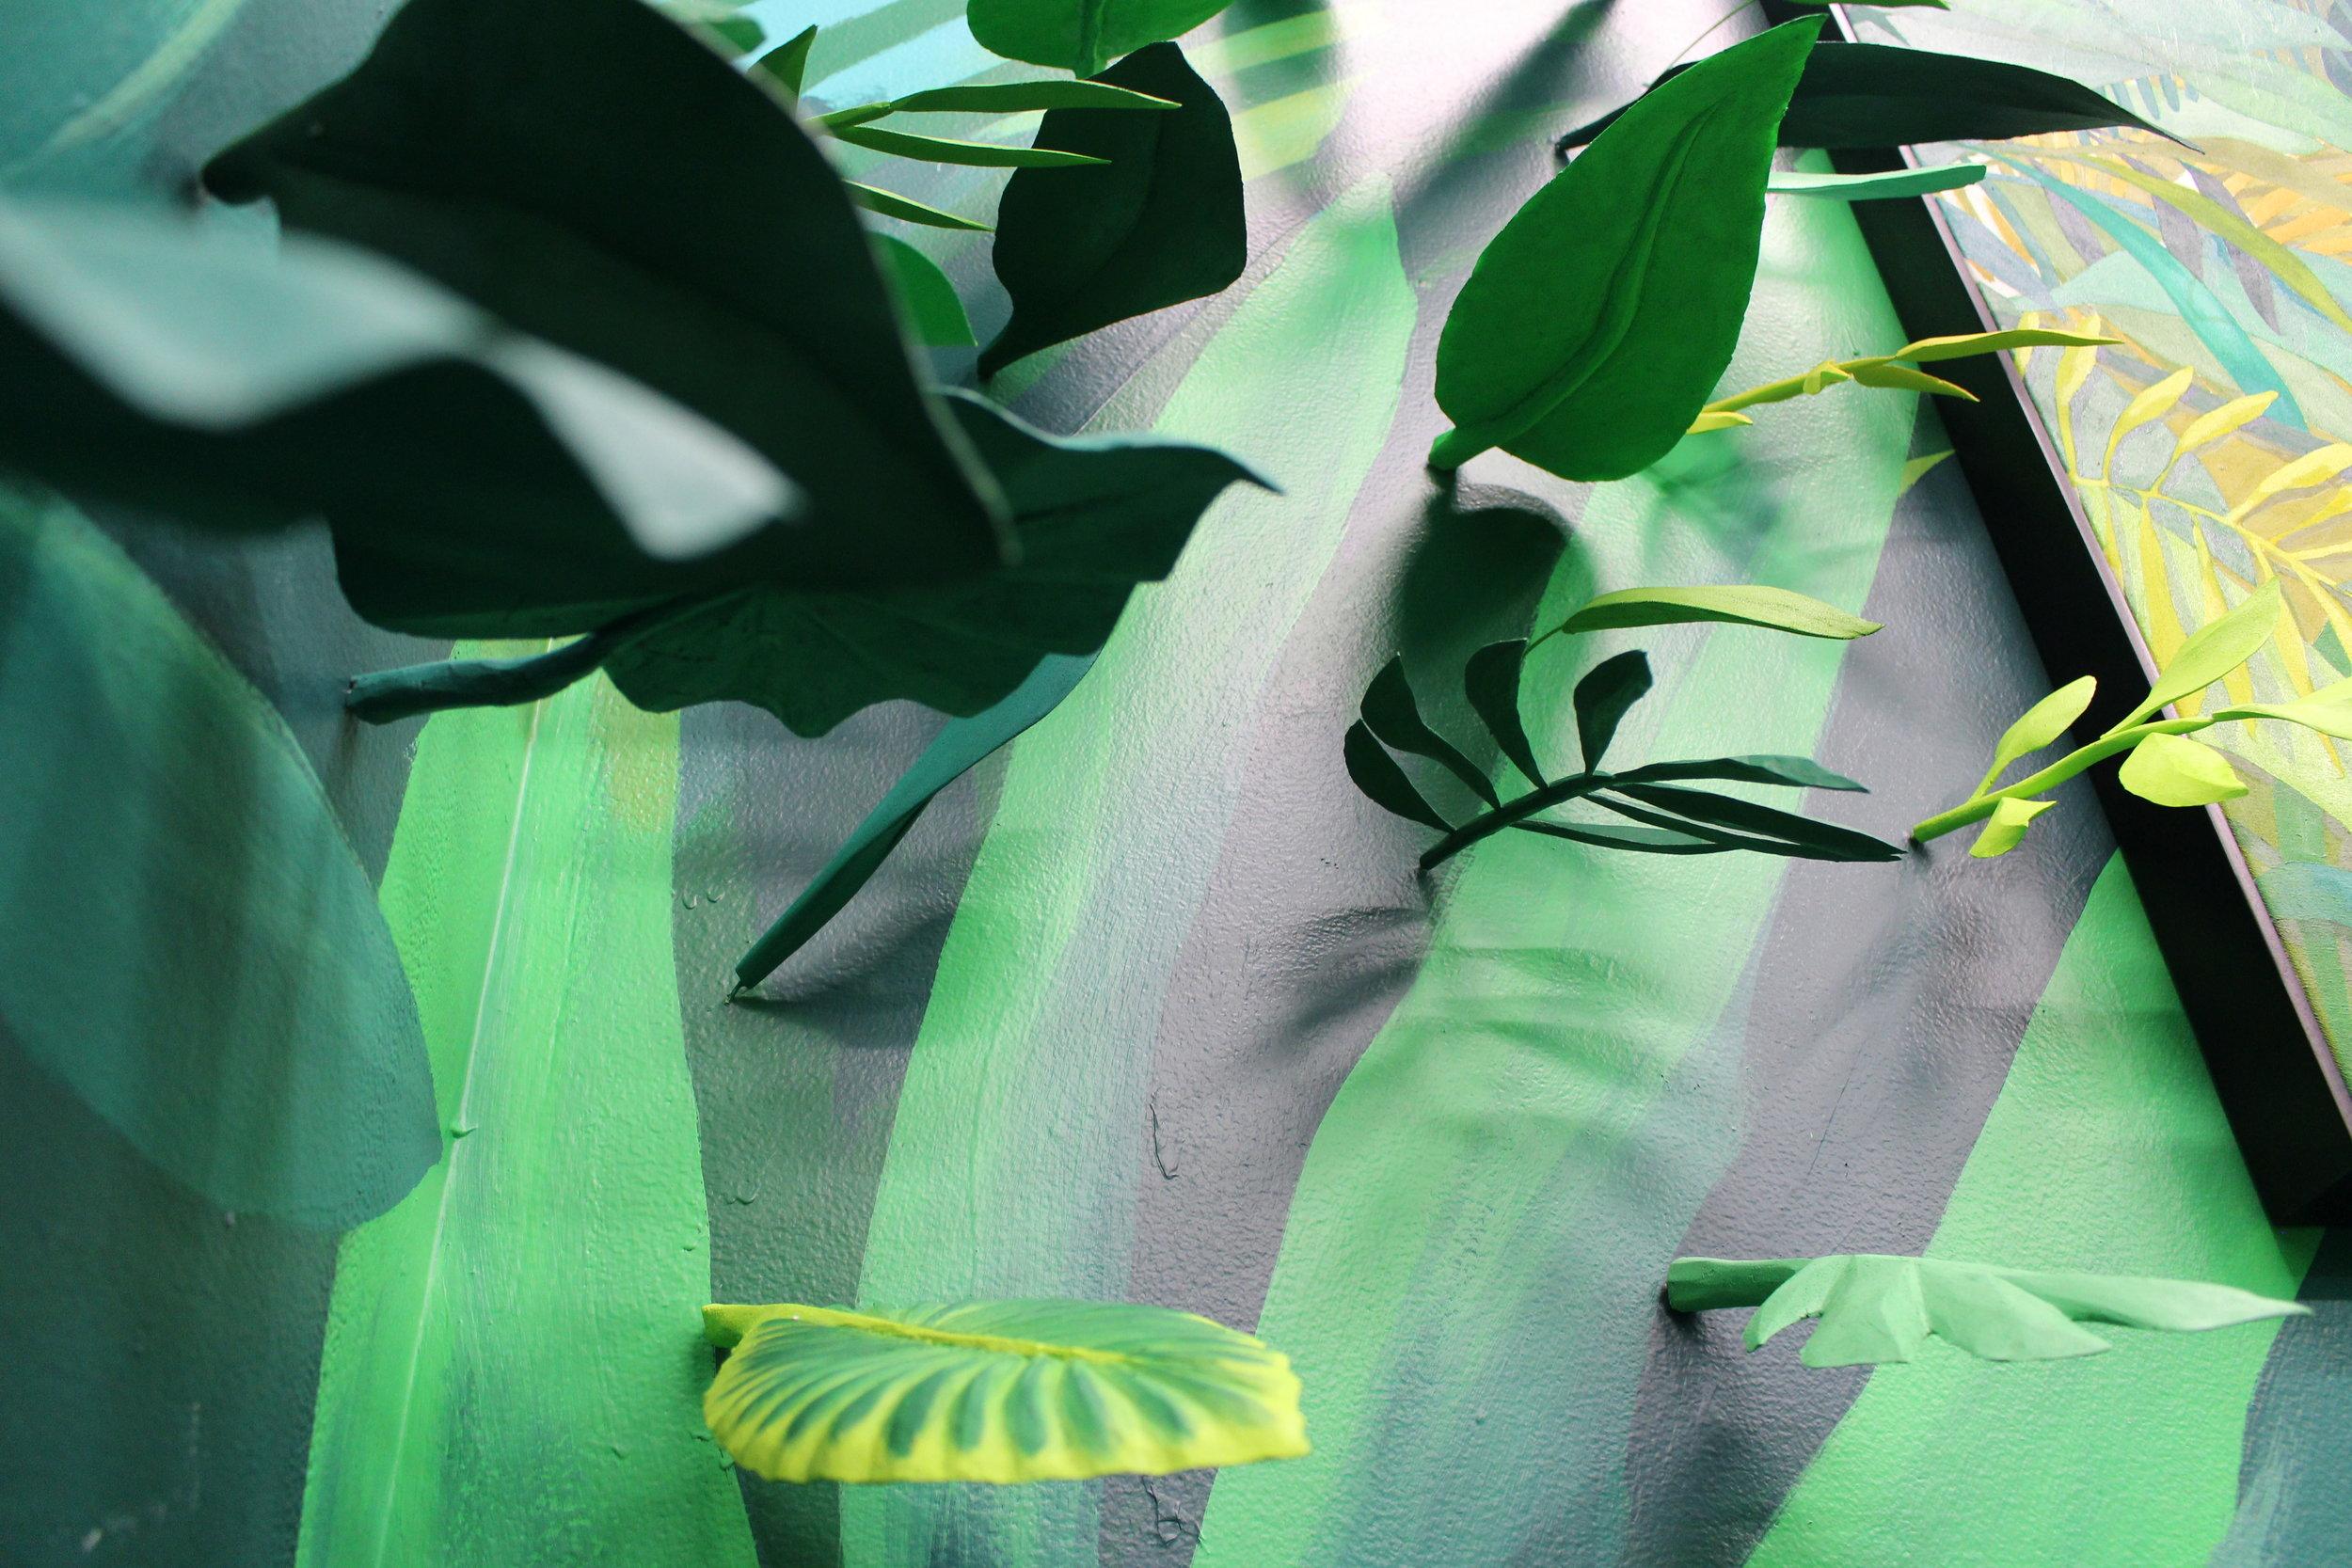 Secrets of Leaves - leaves detail 2.JPG